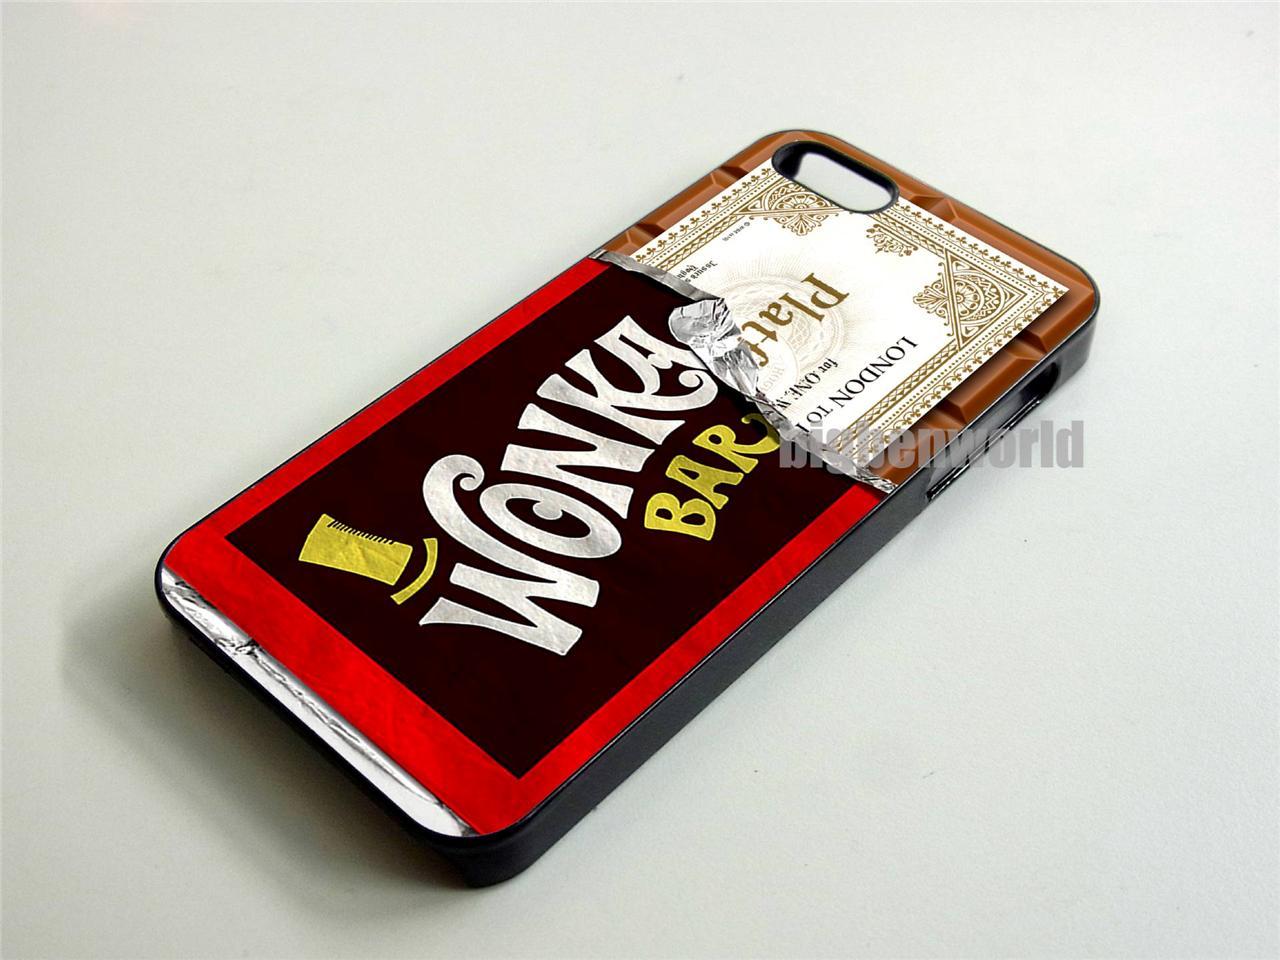 Wonka Chocolate Bar Harry Potter Platform 9 3/4 Ticket iPhone 4 4S ...